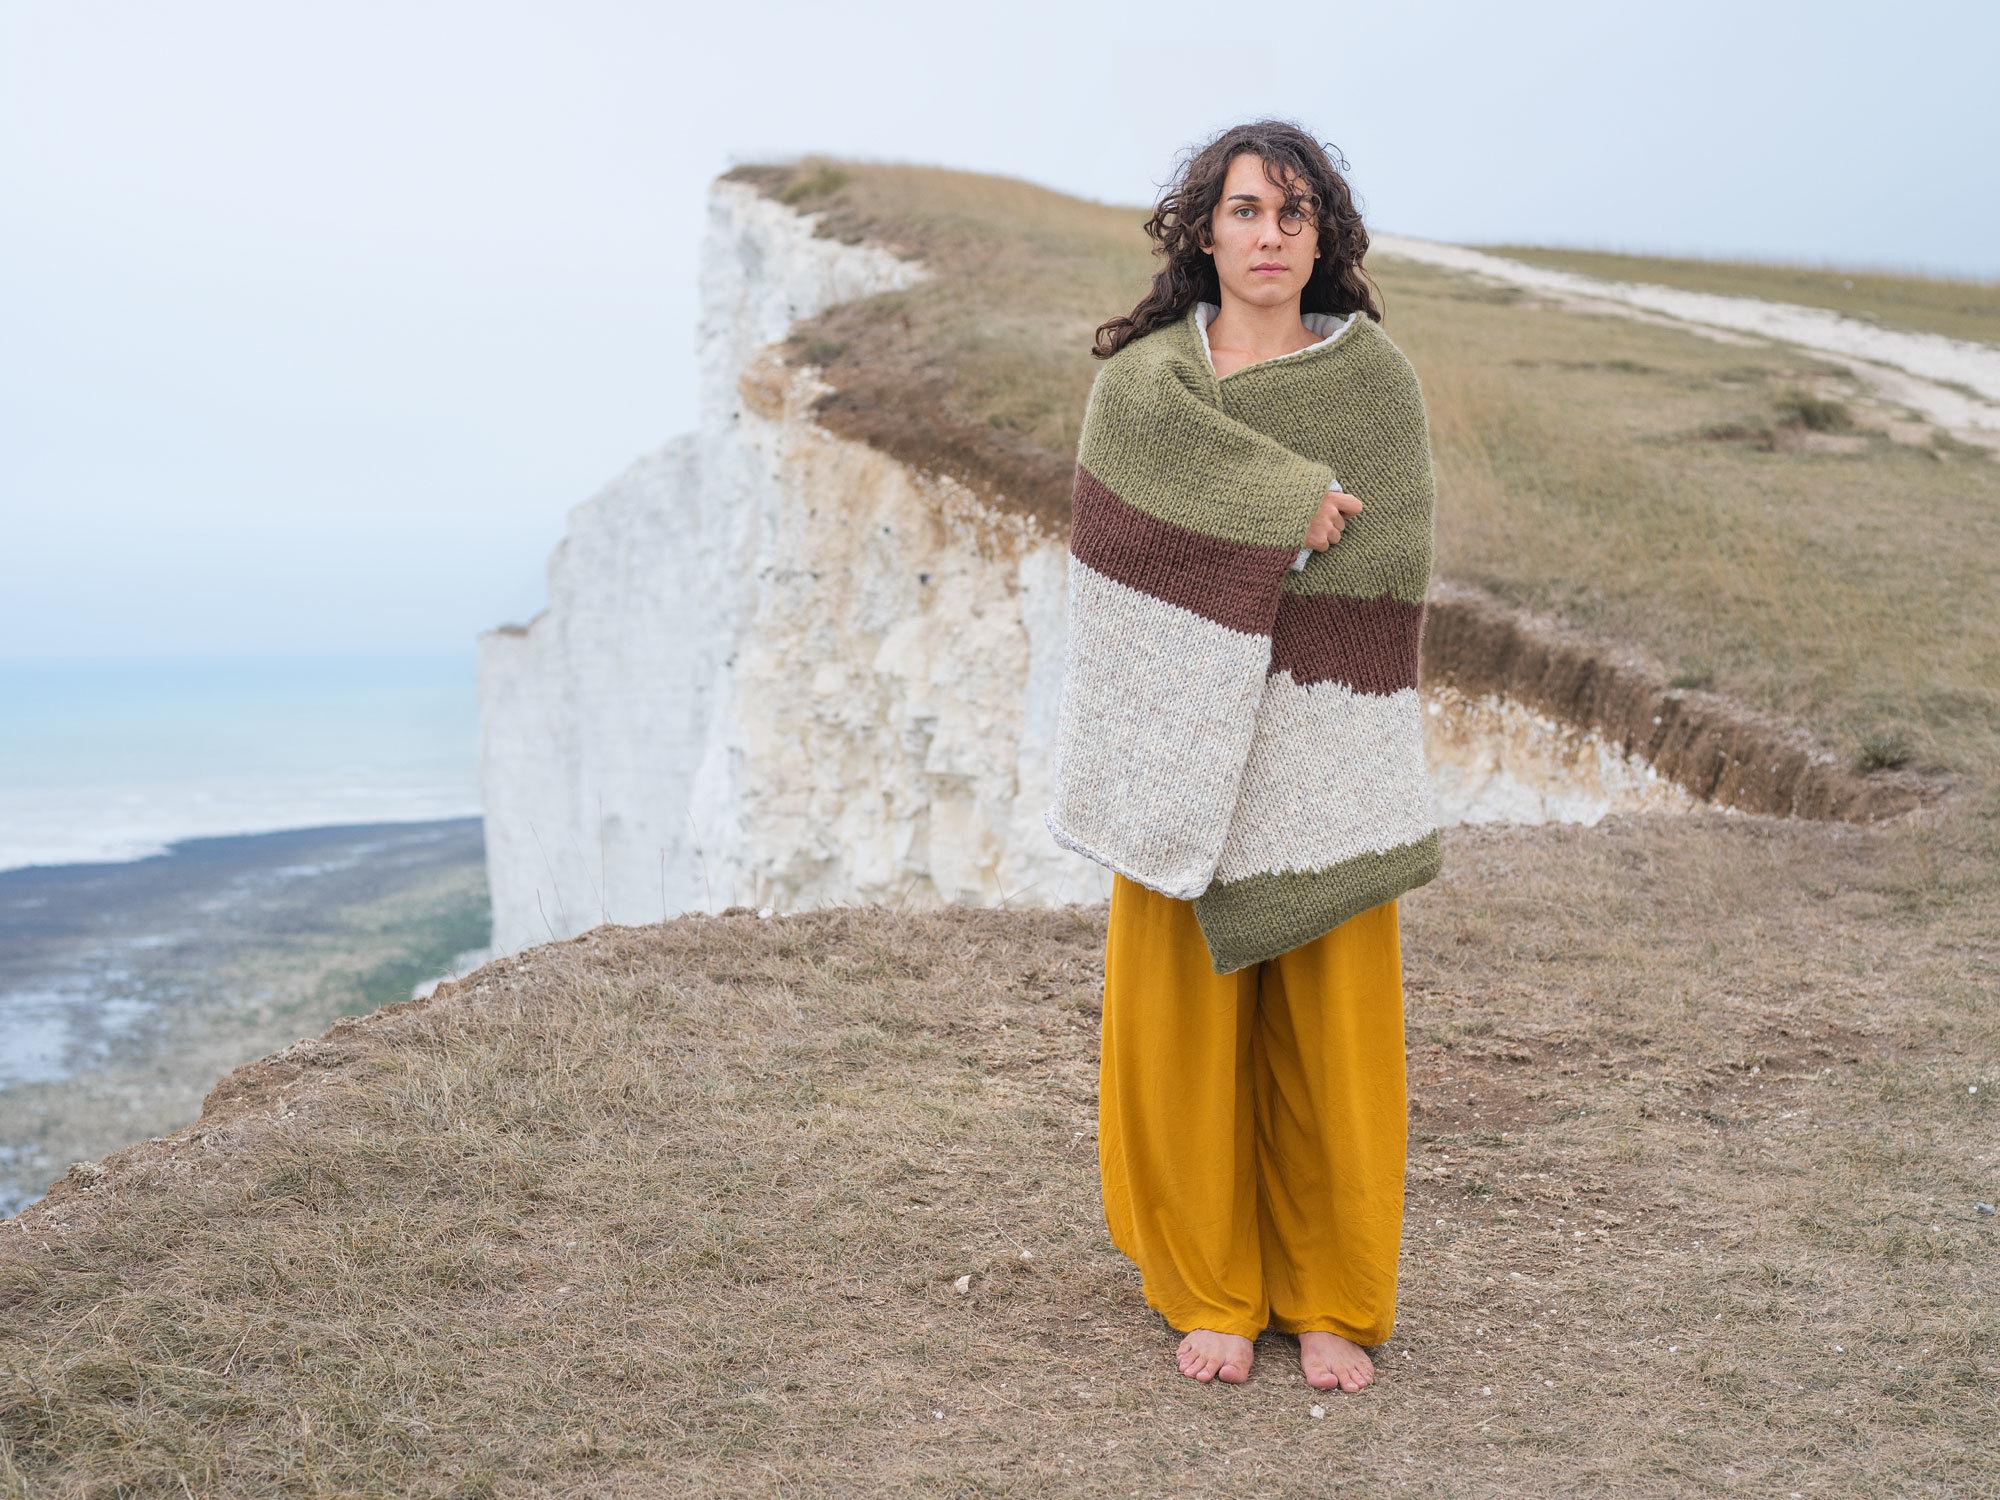 COSMOPOLA GMBH | JOSEPH FORD knitting camouflage BOOK